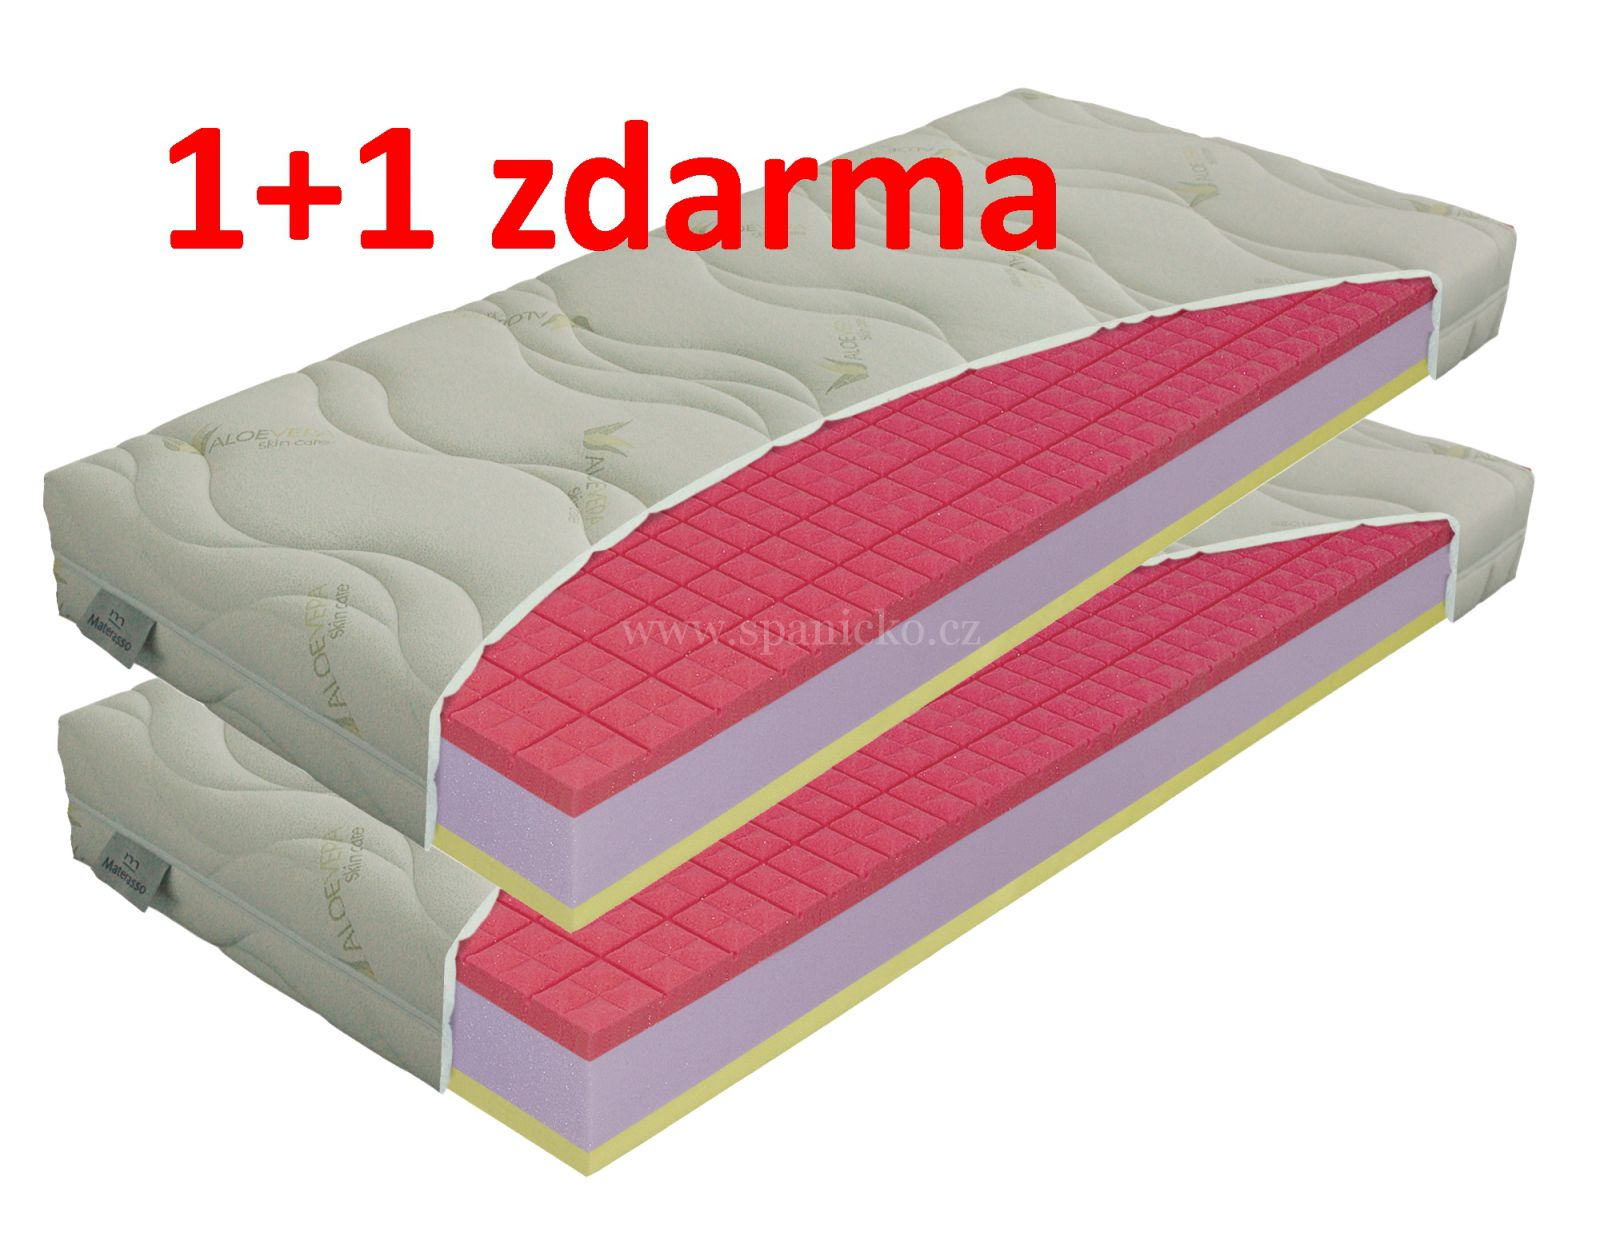 matrace ANTIBACTERIAL visco vakuo 18cm / 1+1 zdarma /+dárek MATERASSO